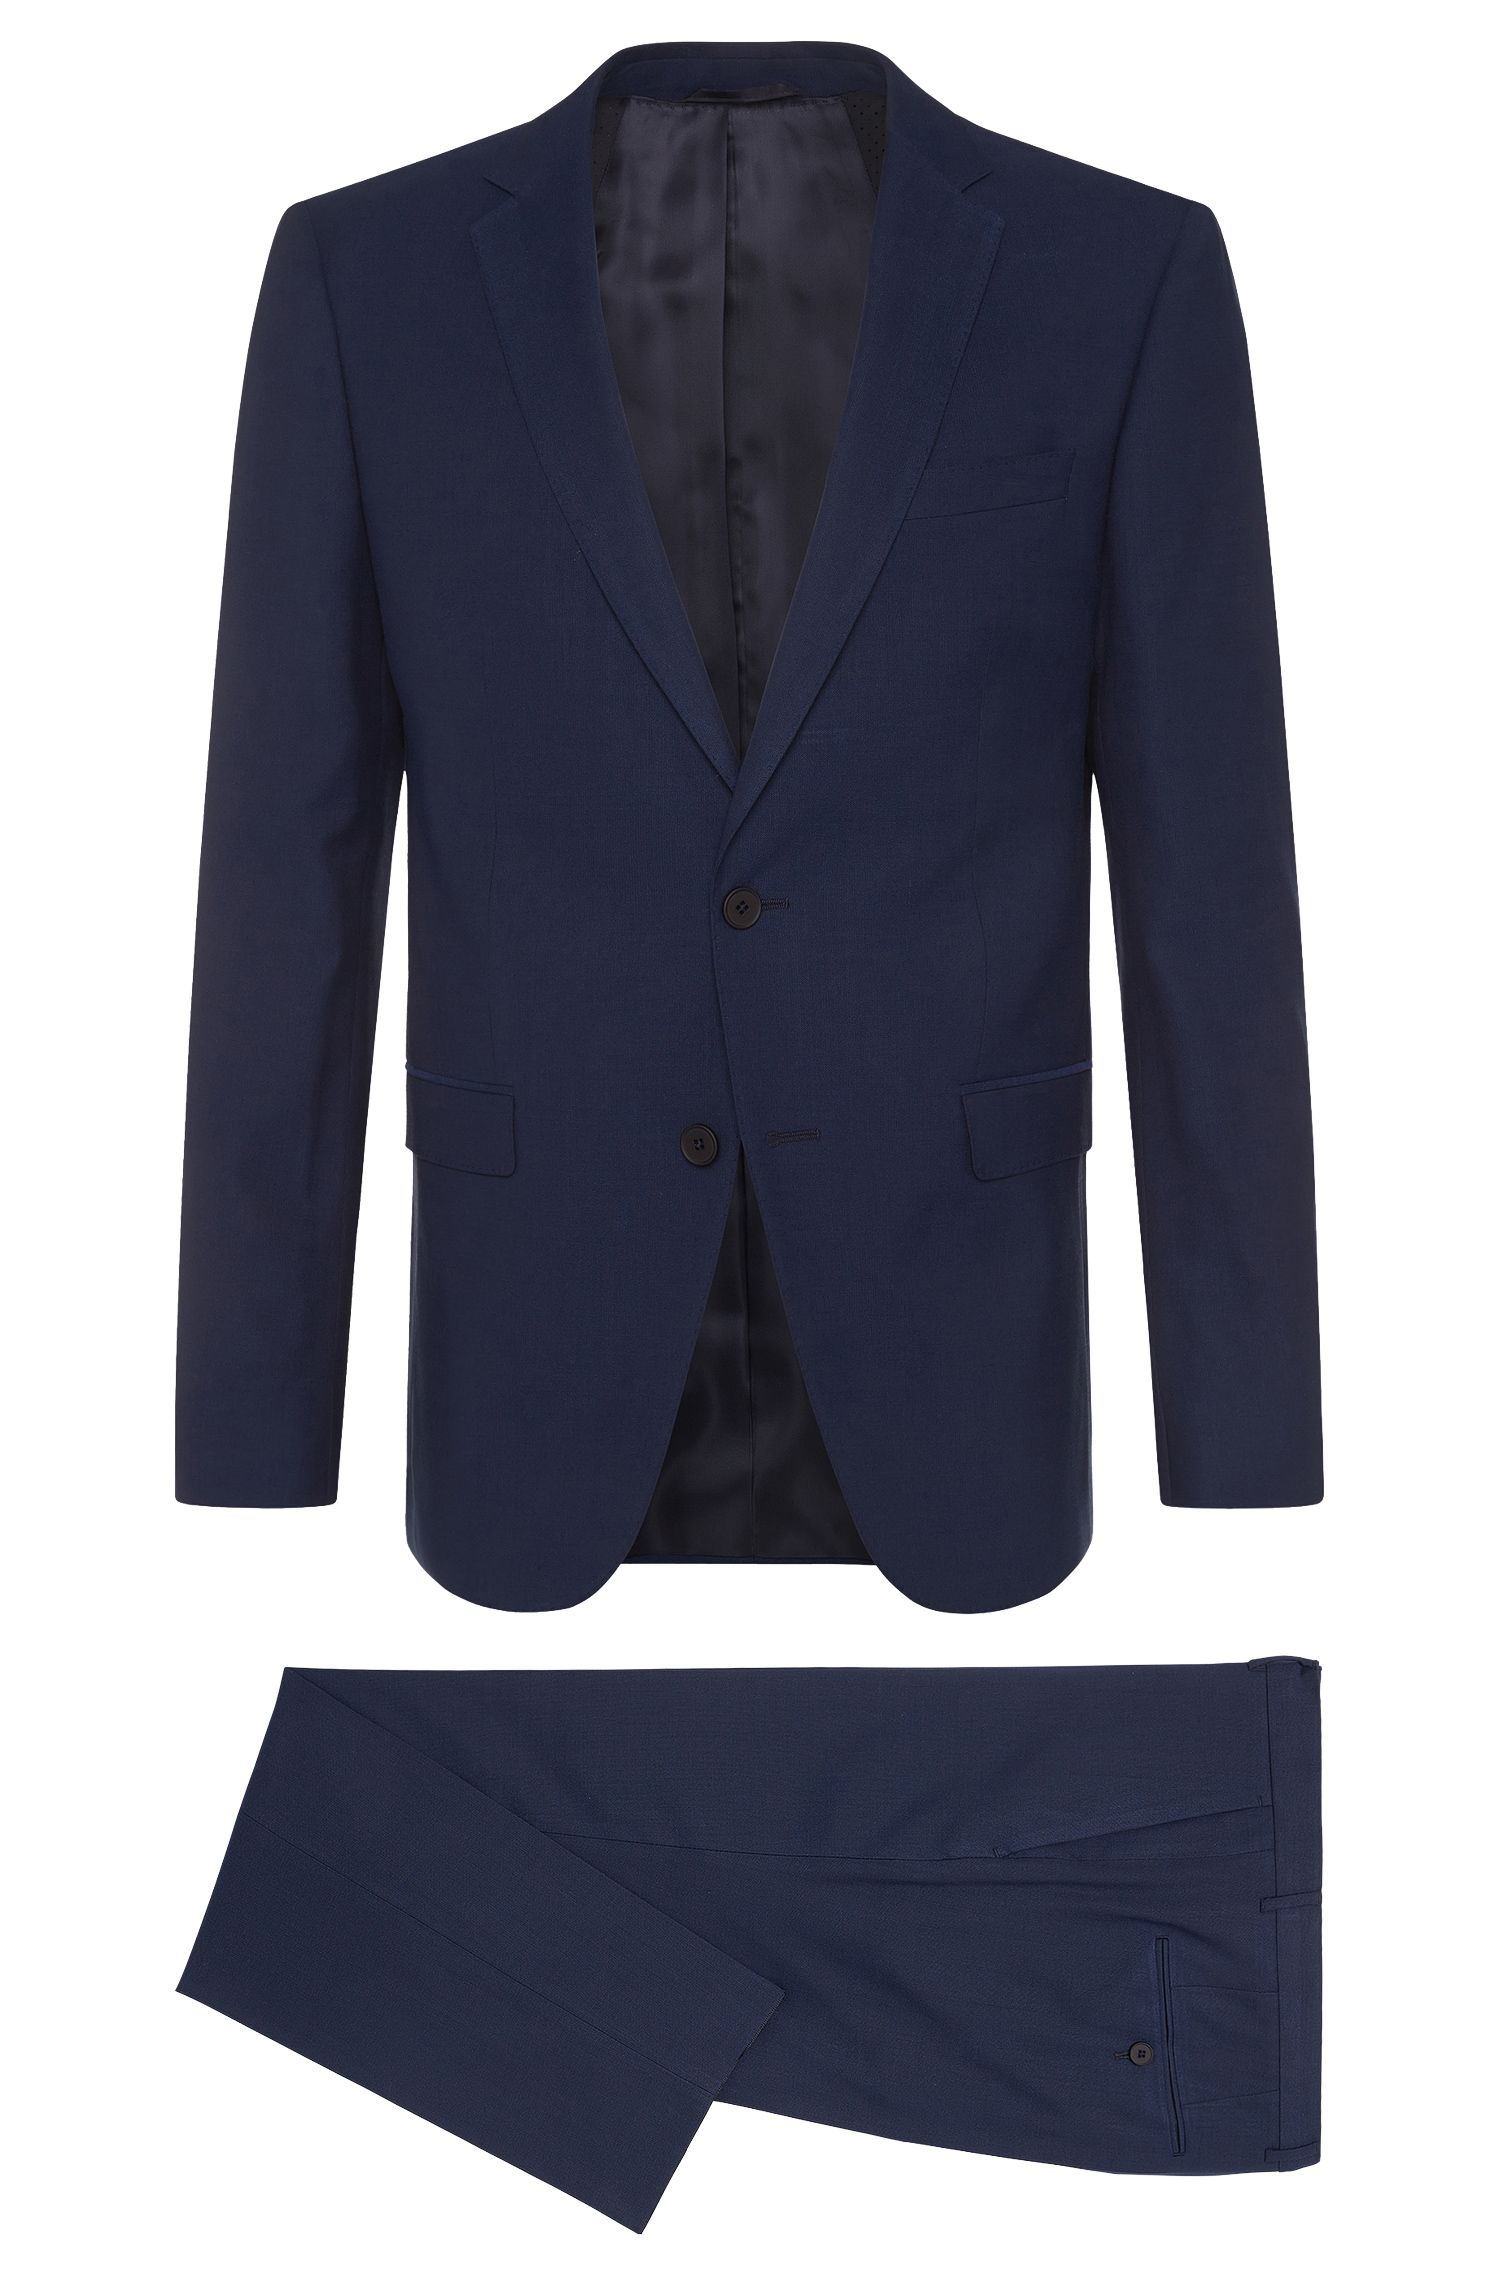 'Nestro/Byte' | Slim Fit, Stretch Wool Cotton Blend Travel Suit